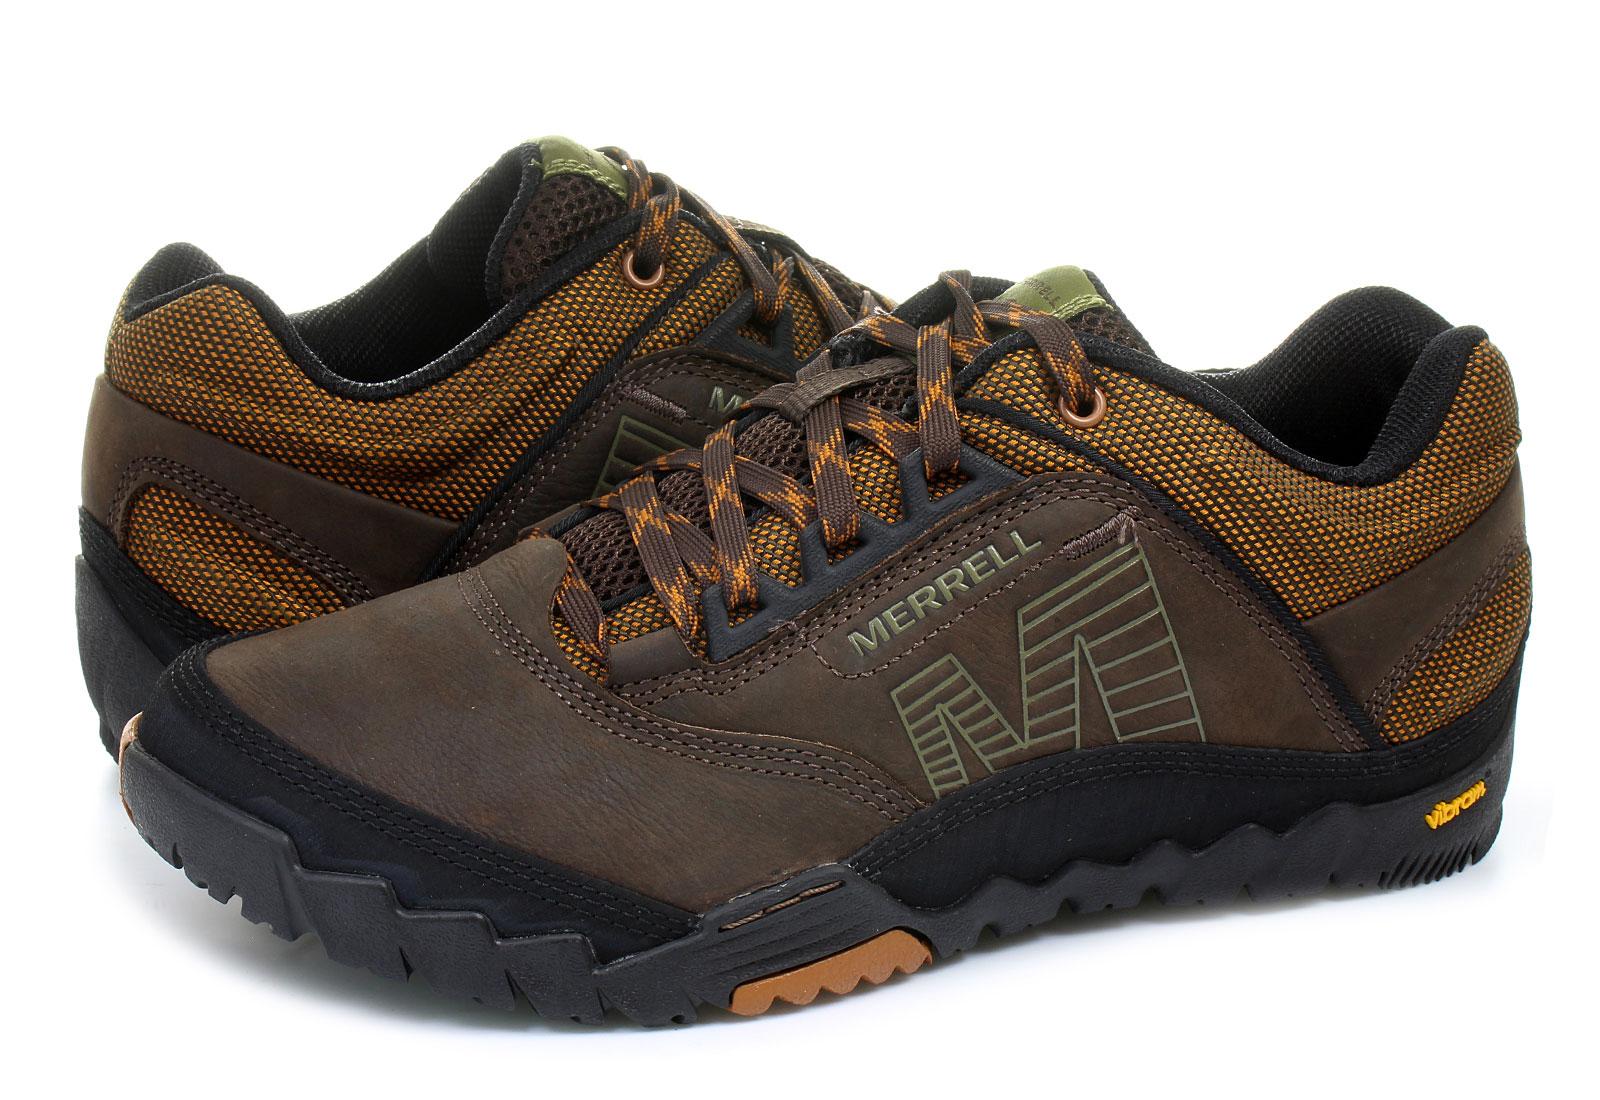 Merrell Cipő - Annex - J21193-dbr - Office Shoes Magyarország 791ae2ec4c